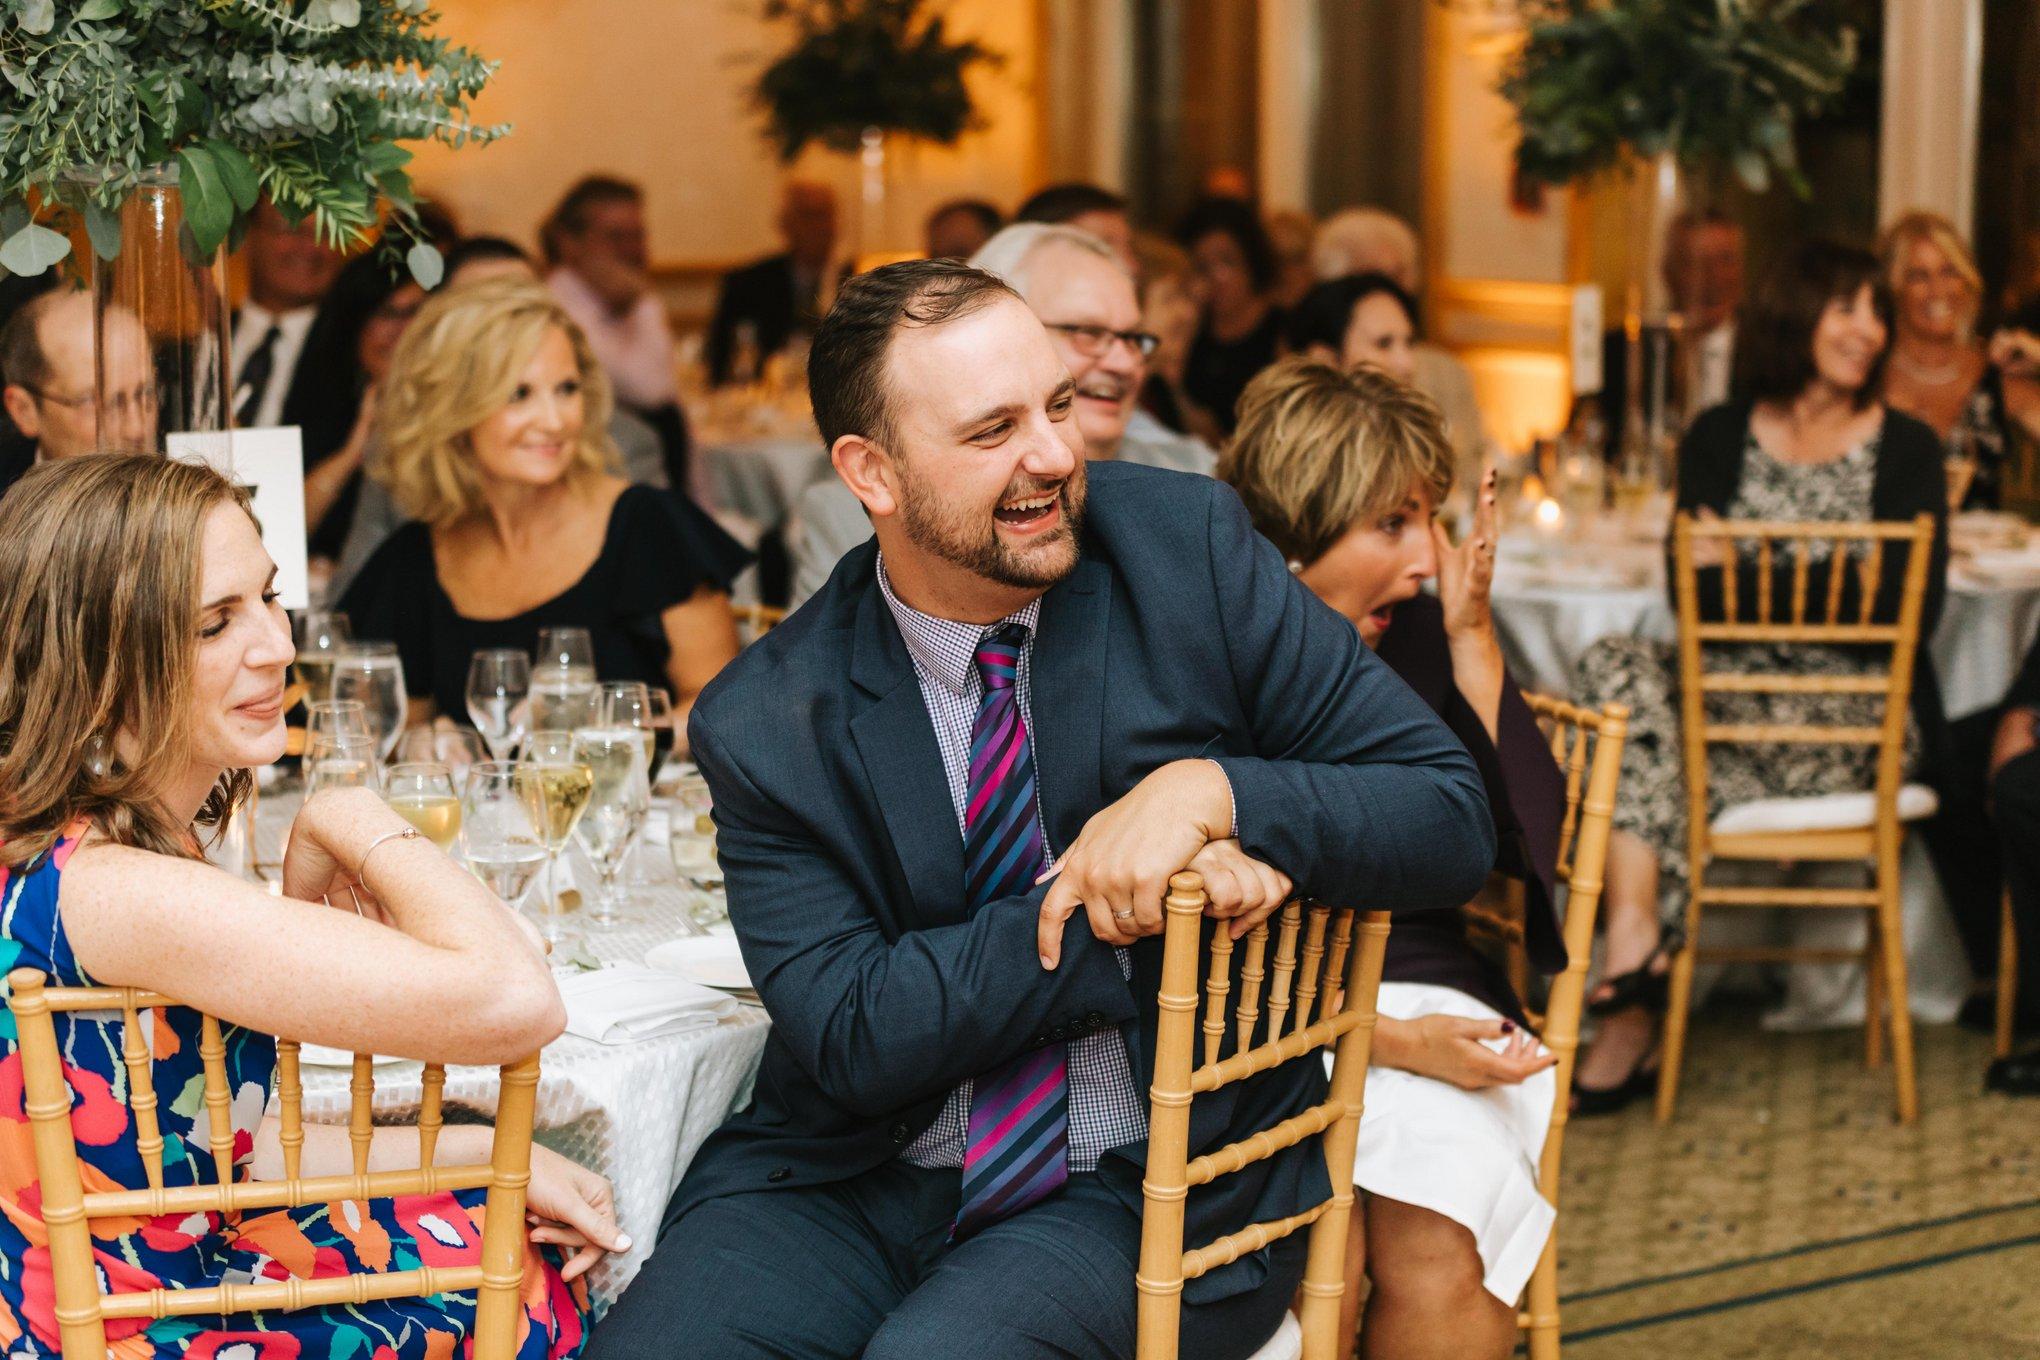 Wequassett-Wedding-Photographer-Cape-Cod-Boston-Lena-Mirisola-45.jpg